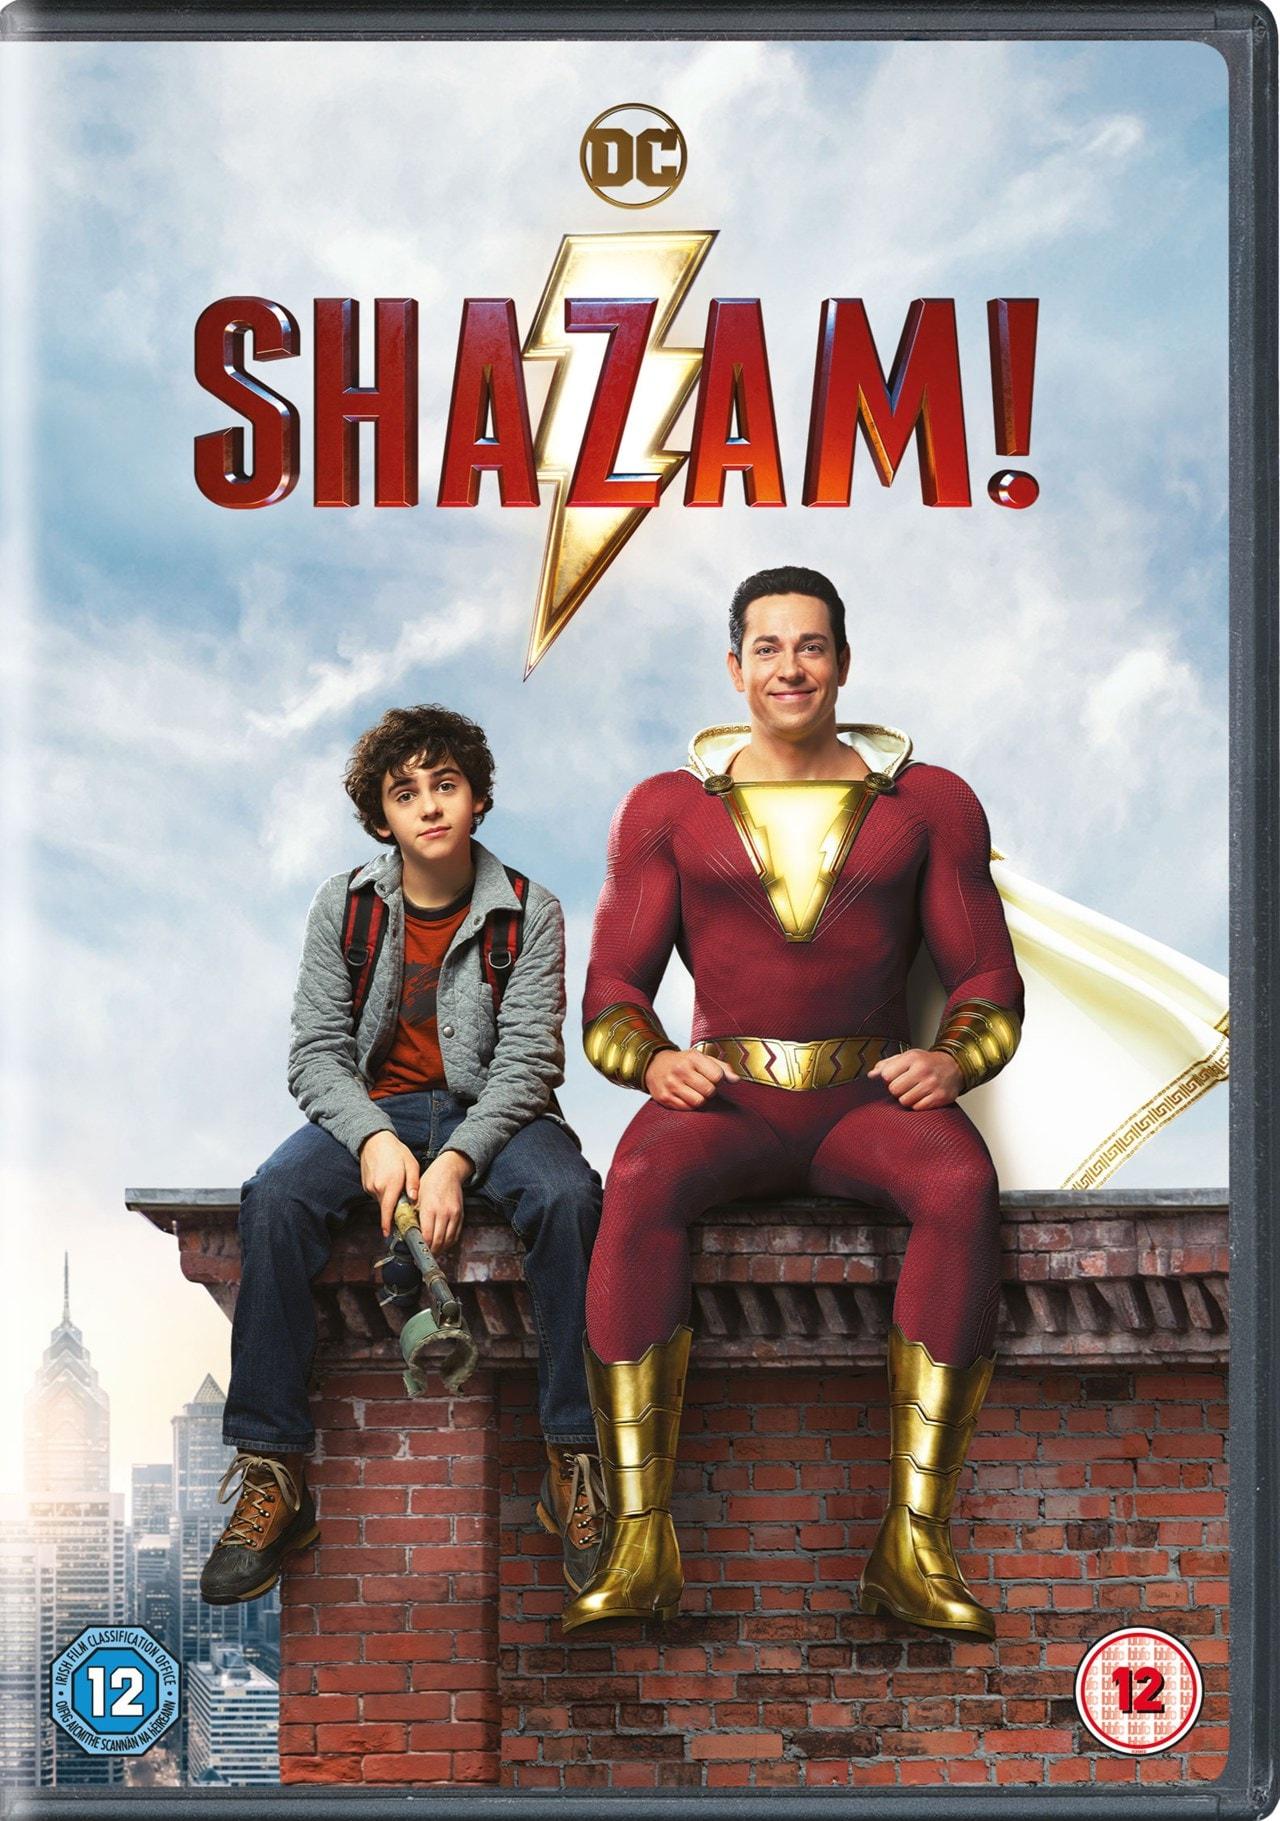 SHAZAM! Stills Put The Spotlight On The Marvel Family, A